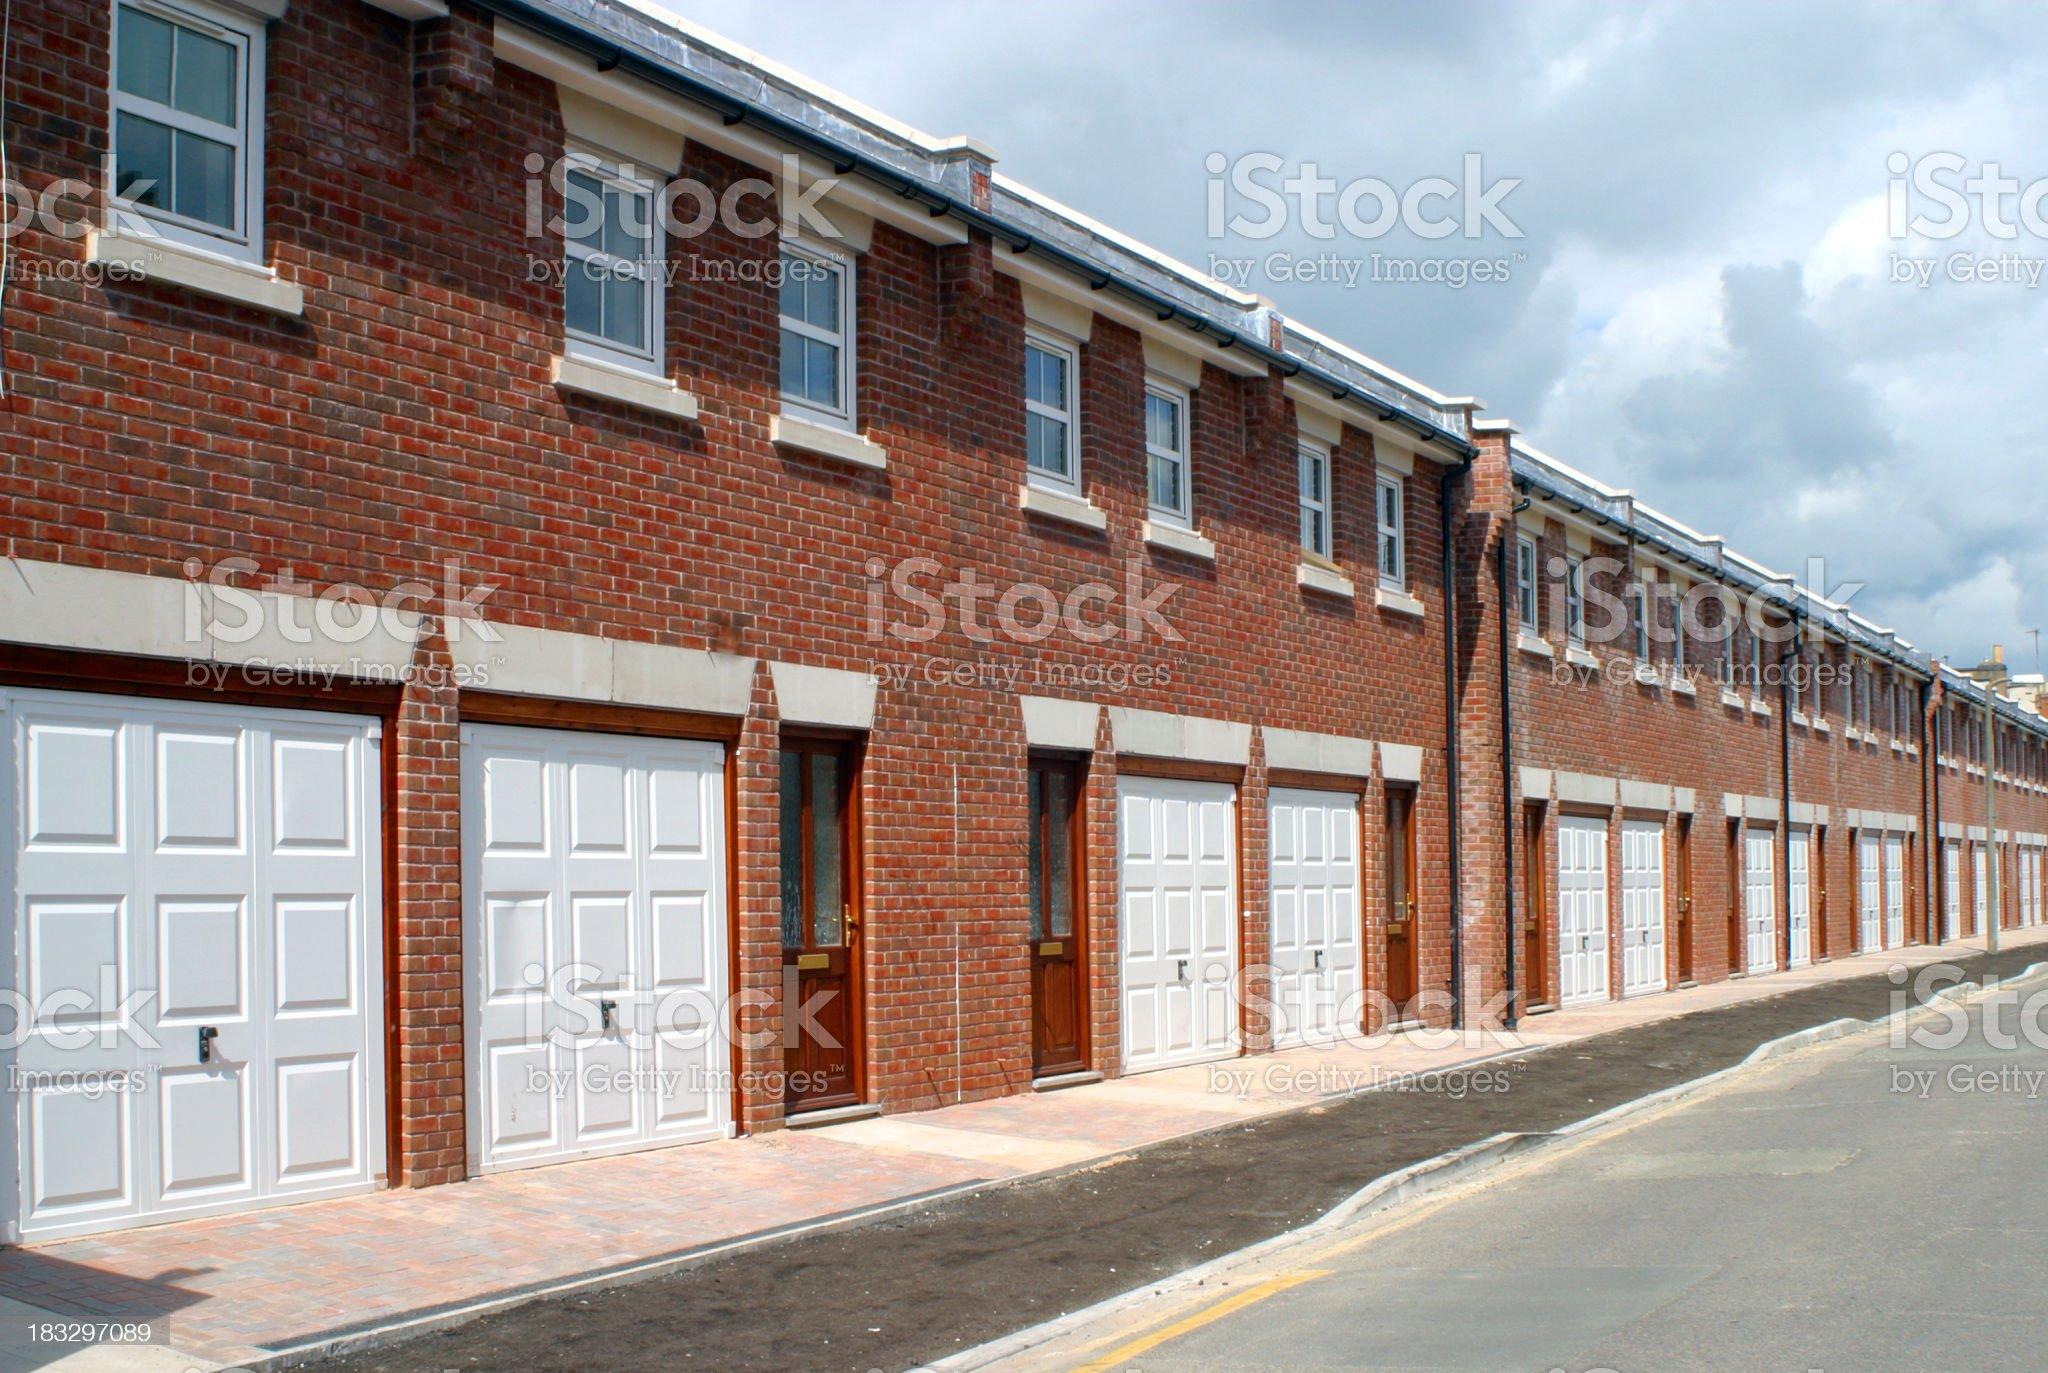 New homes - UK royalty-free stock photo